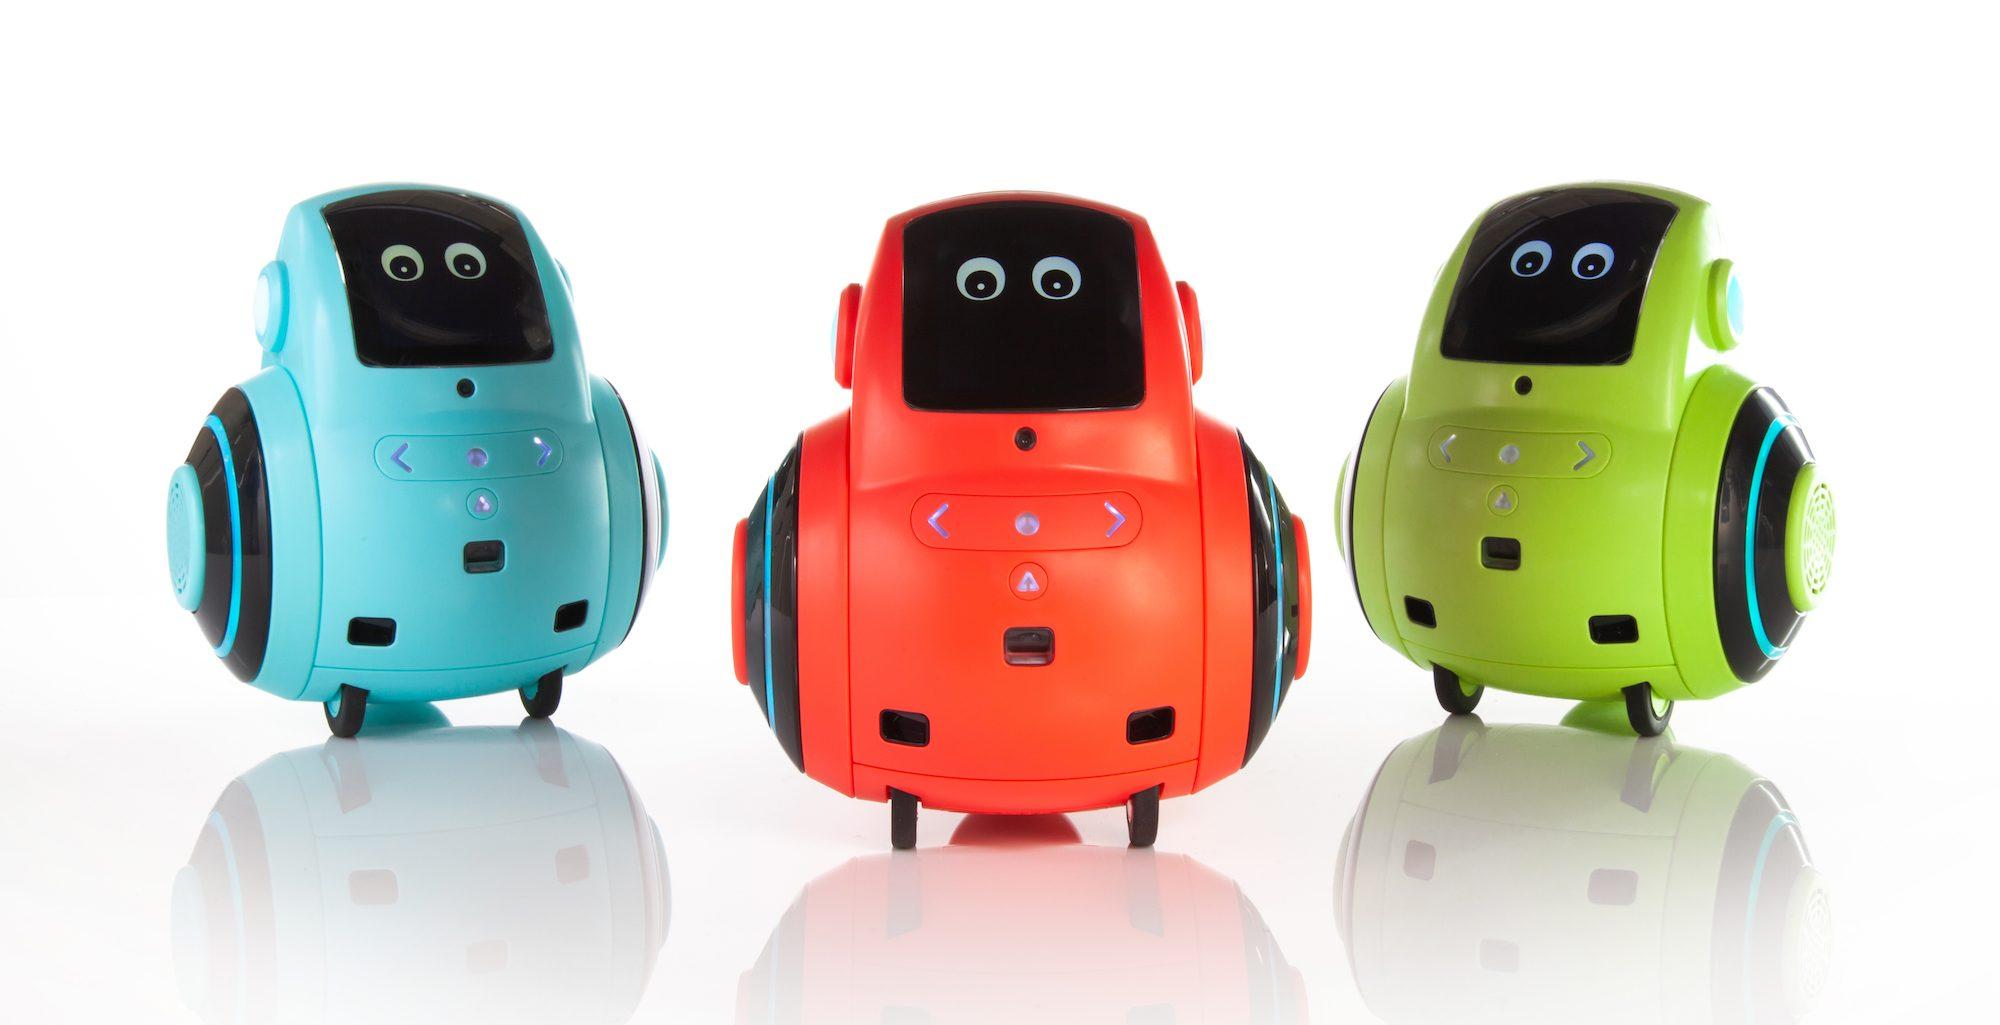 Robotics startup Miko